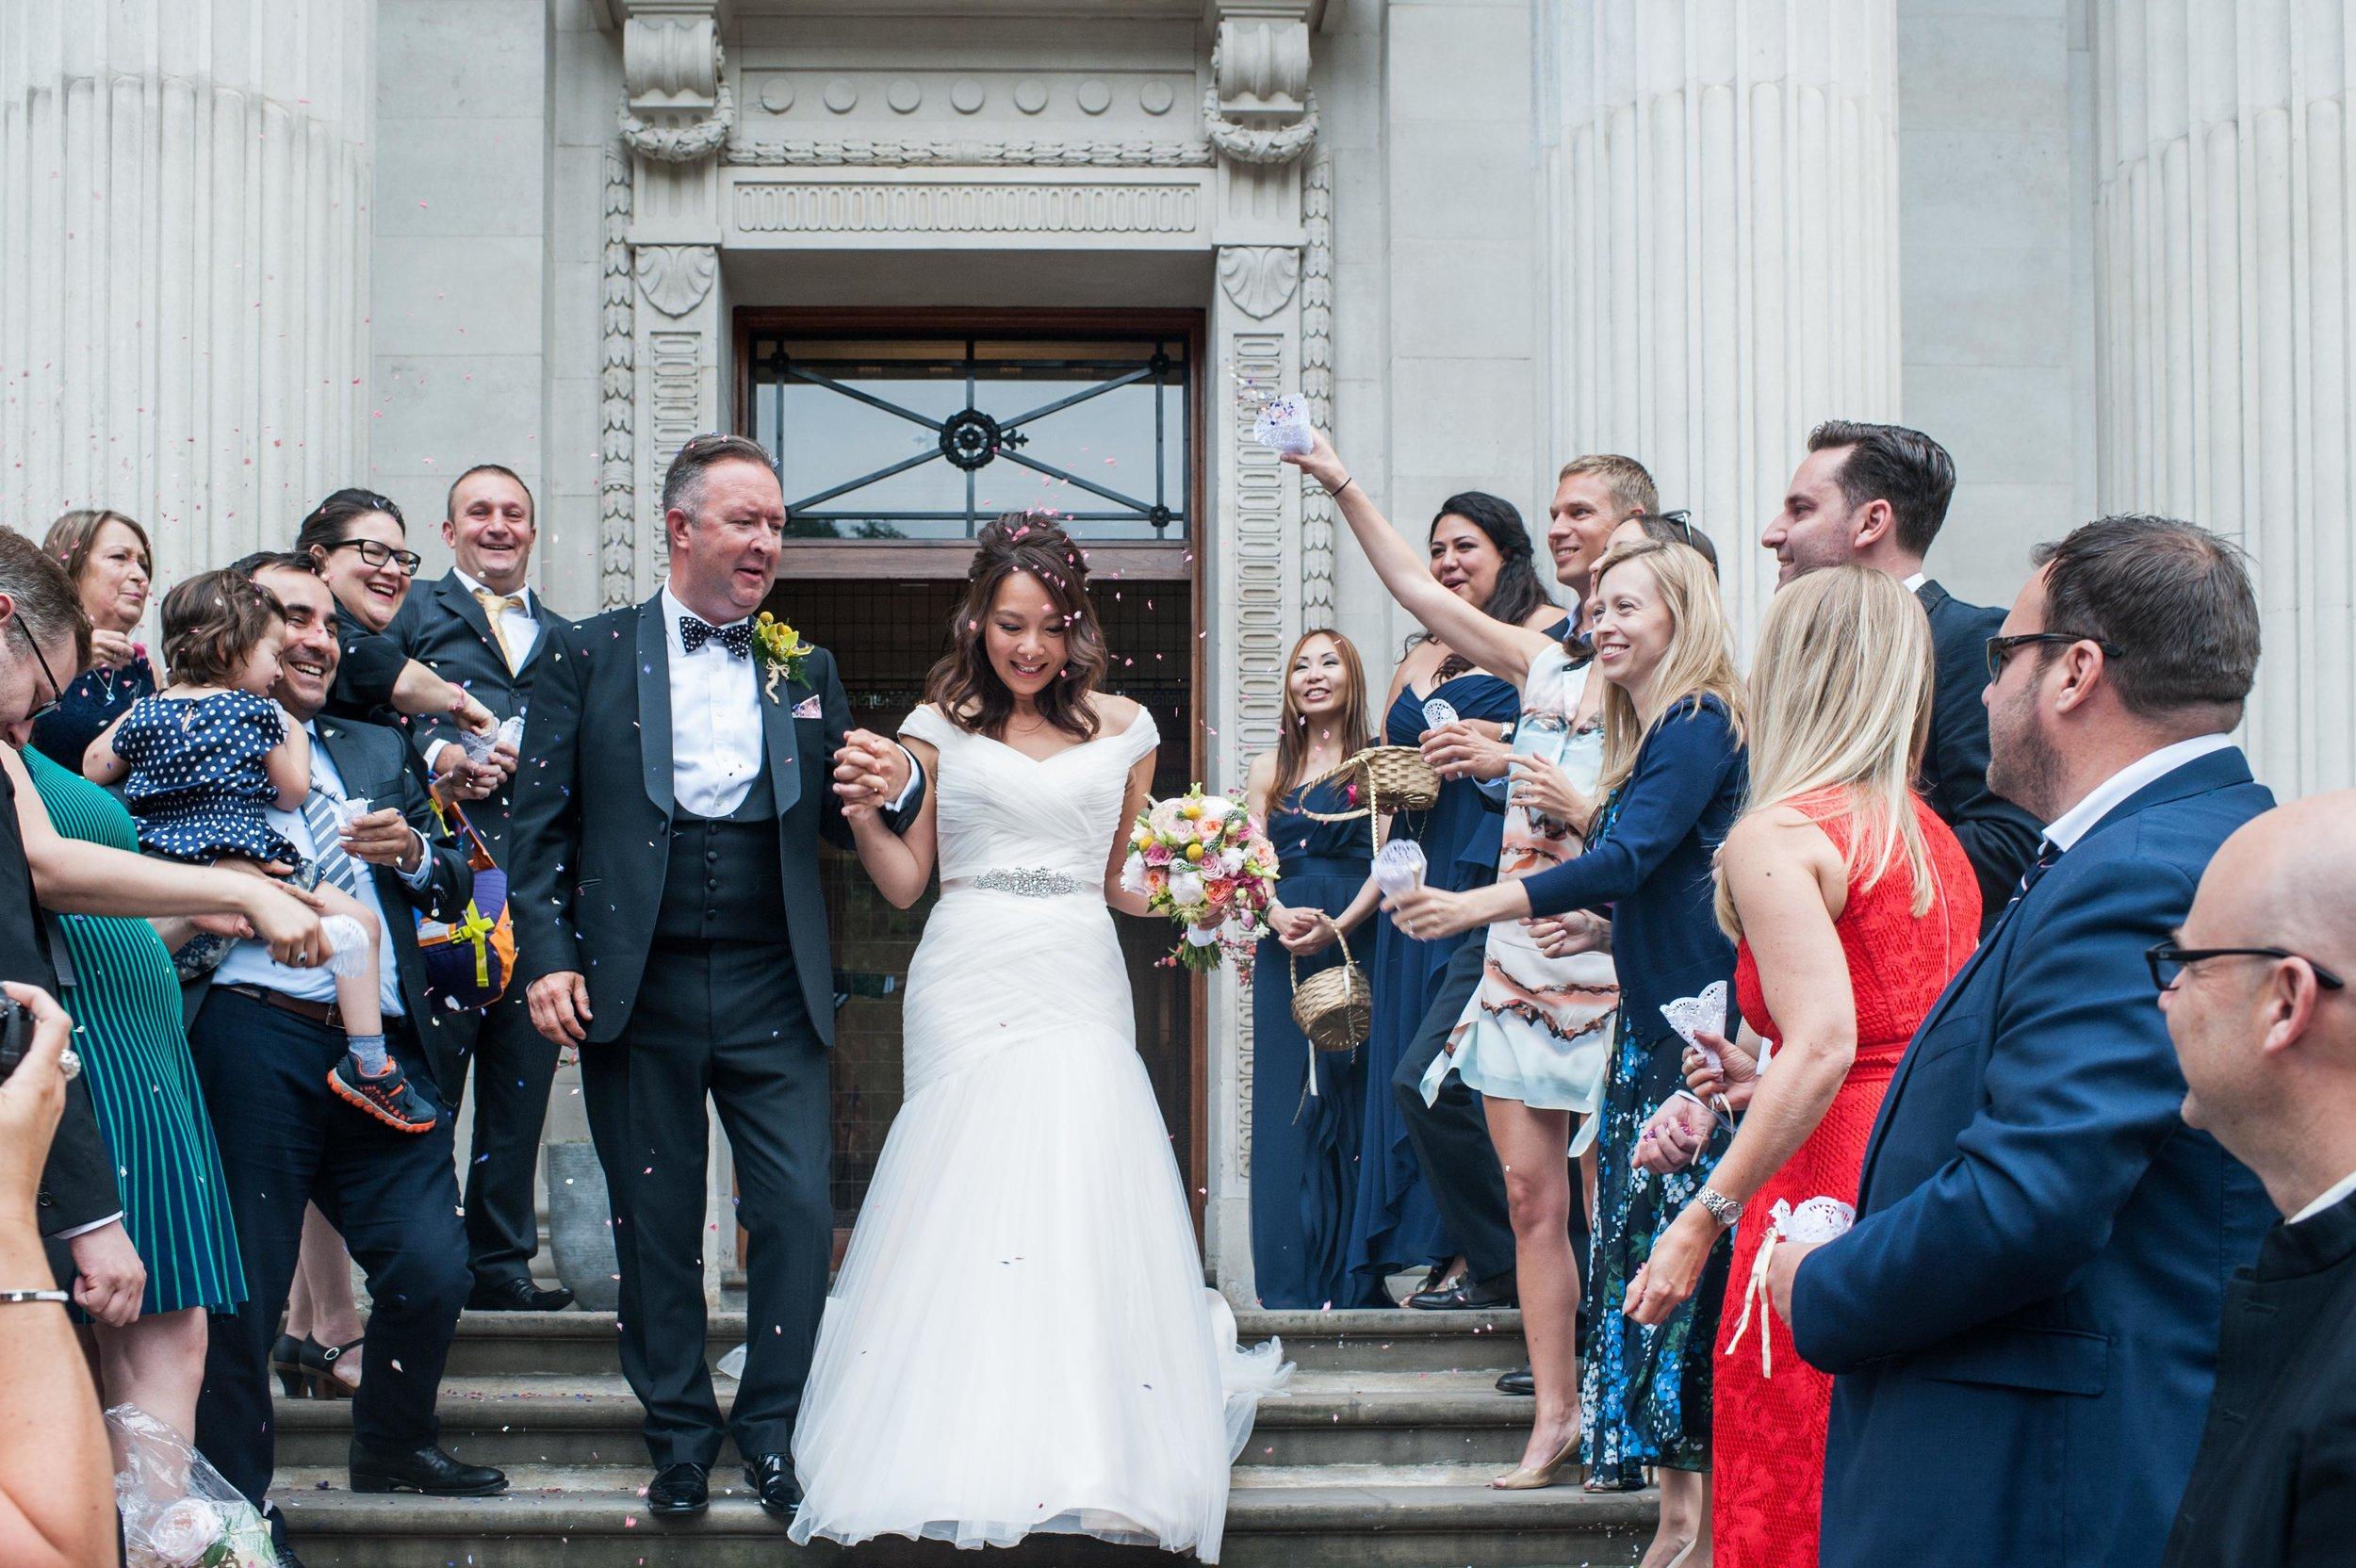 D&M_Marylebone Town Hall Wedding (126 of 239).jpg